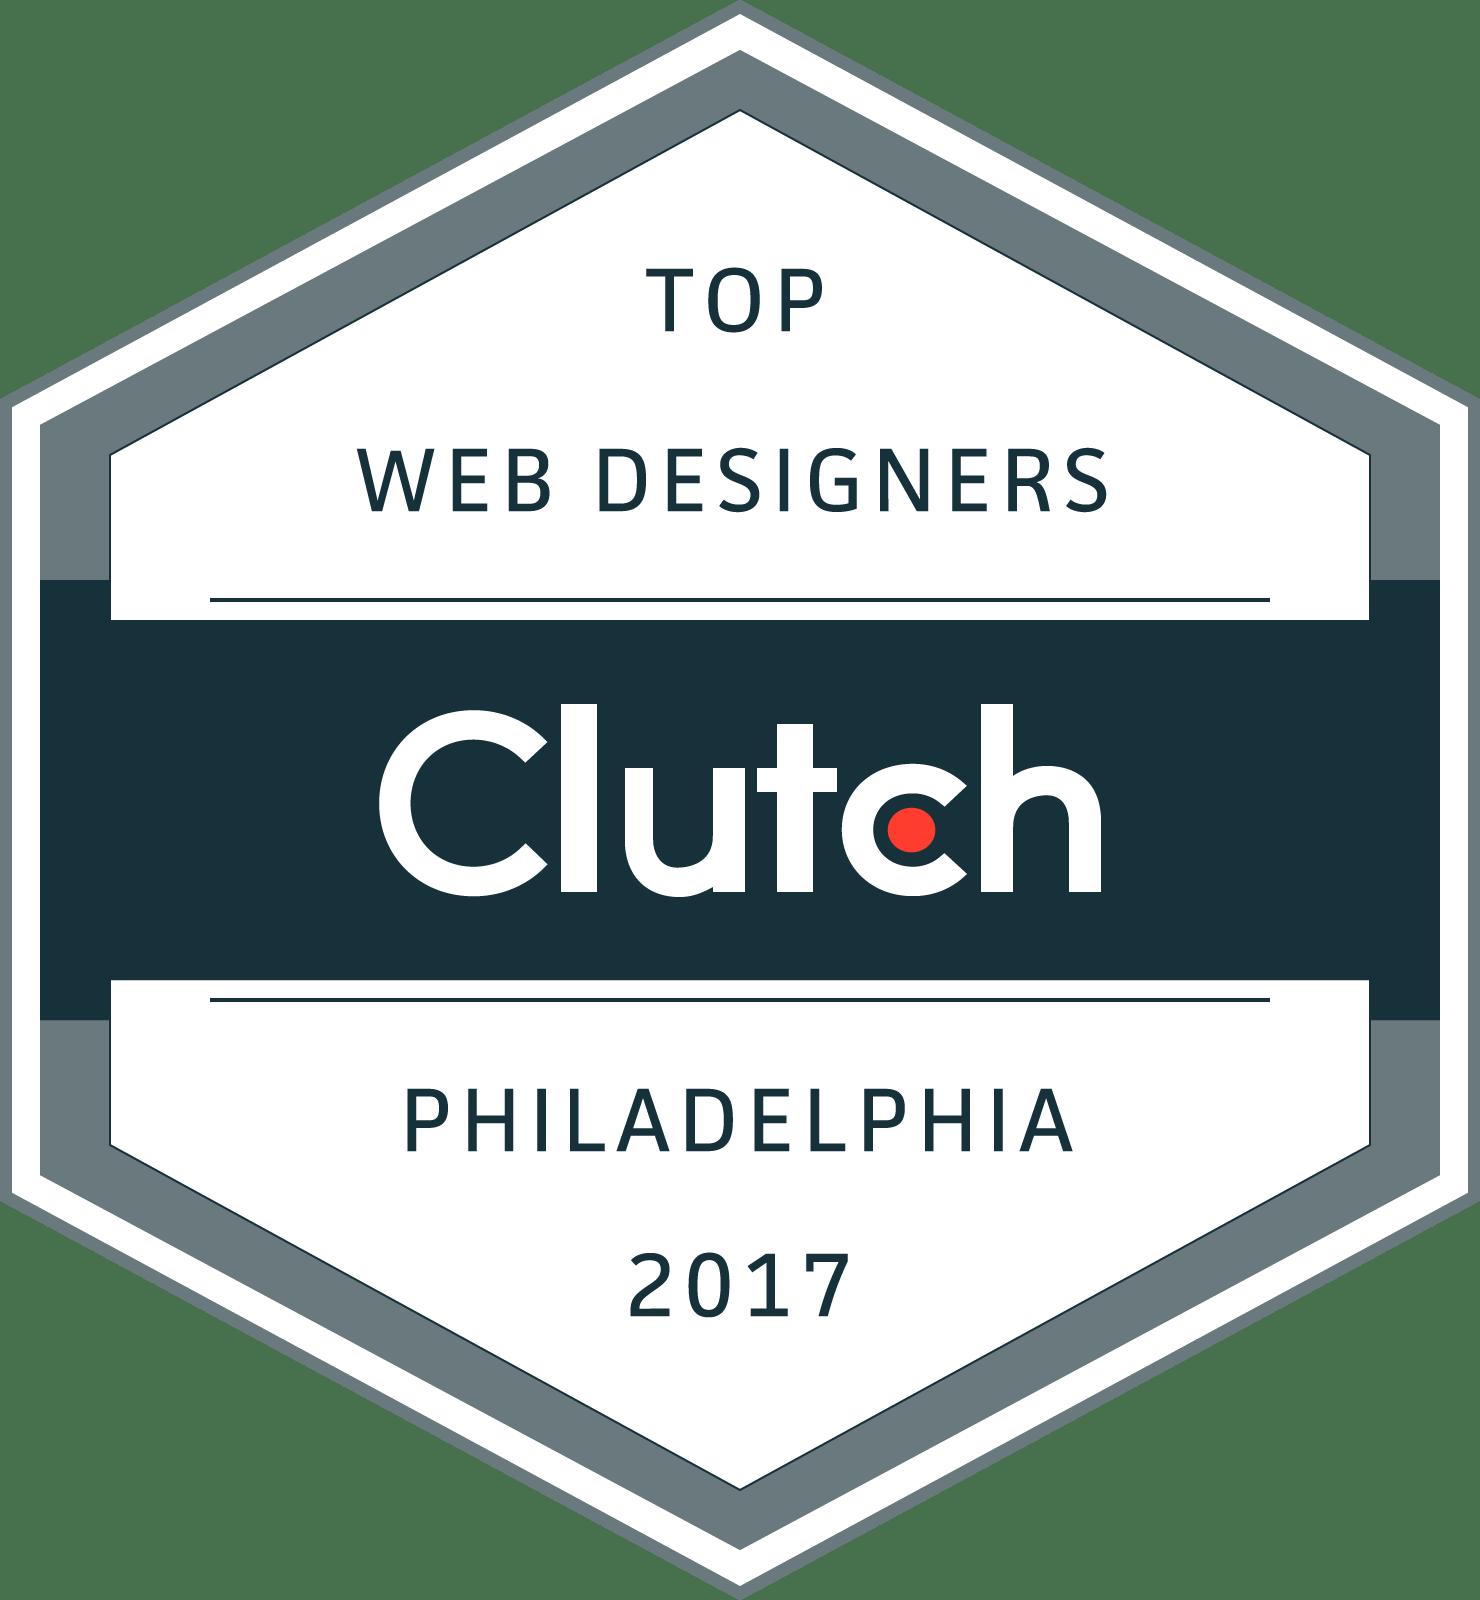 web_designers_philadelphia_2017